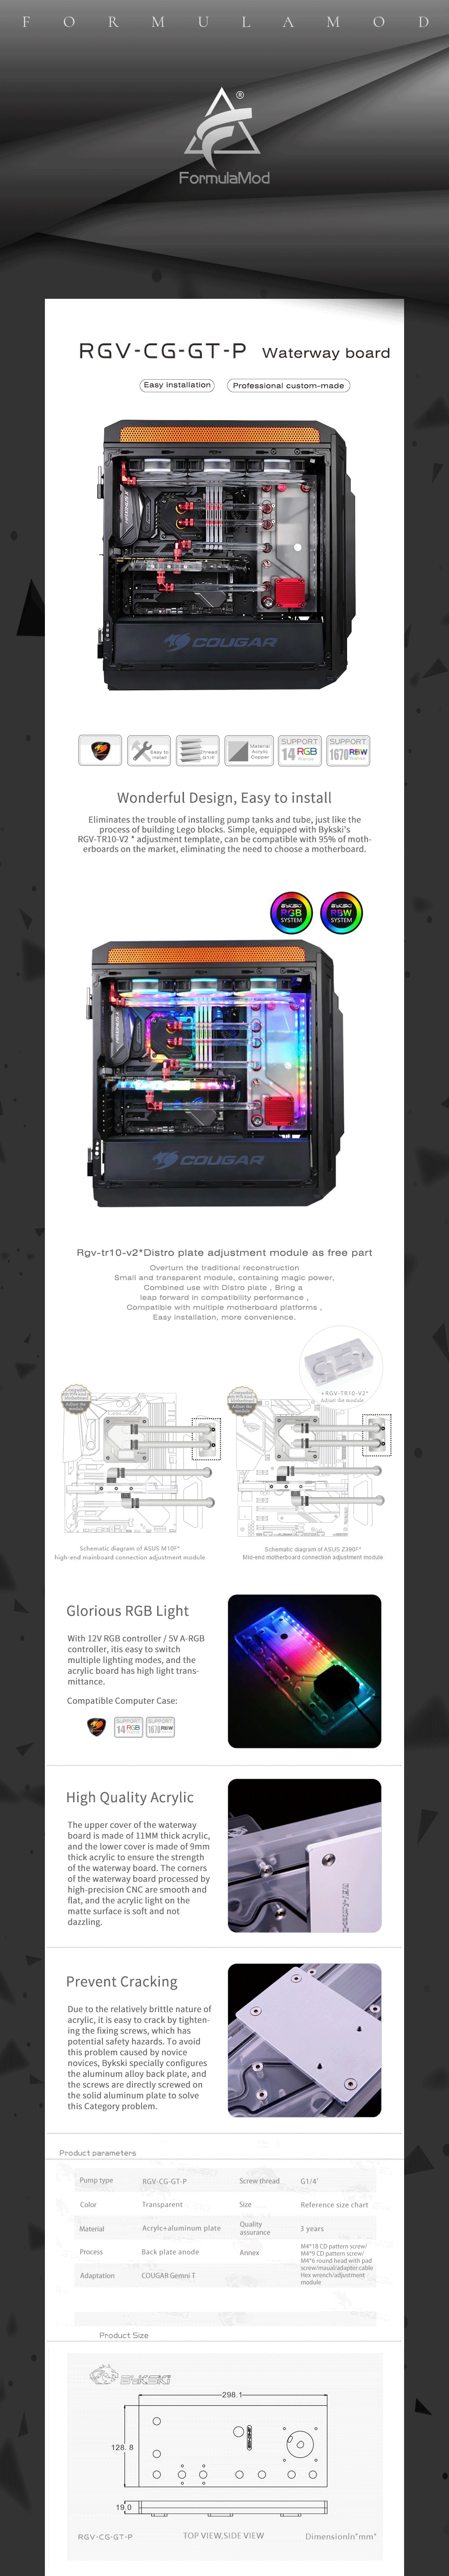 Bykski Waterway Cooling Kit For COUGAR Gemini T Case, 5V ARGB, For Single GPU Building, RGV-CG-GT-P